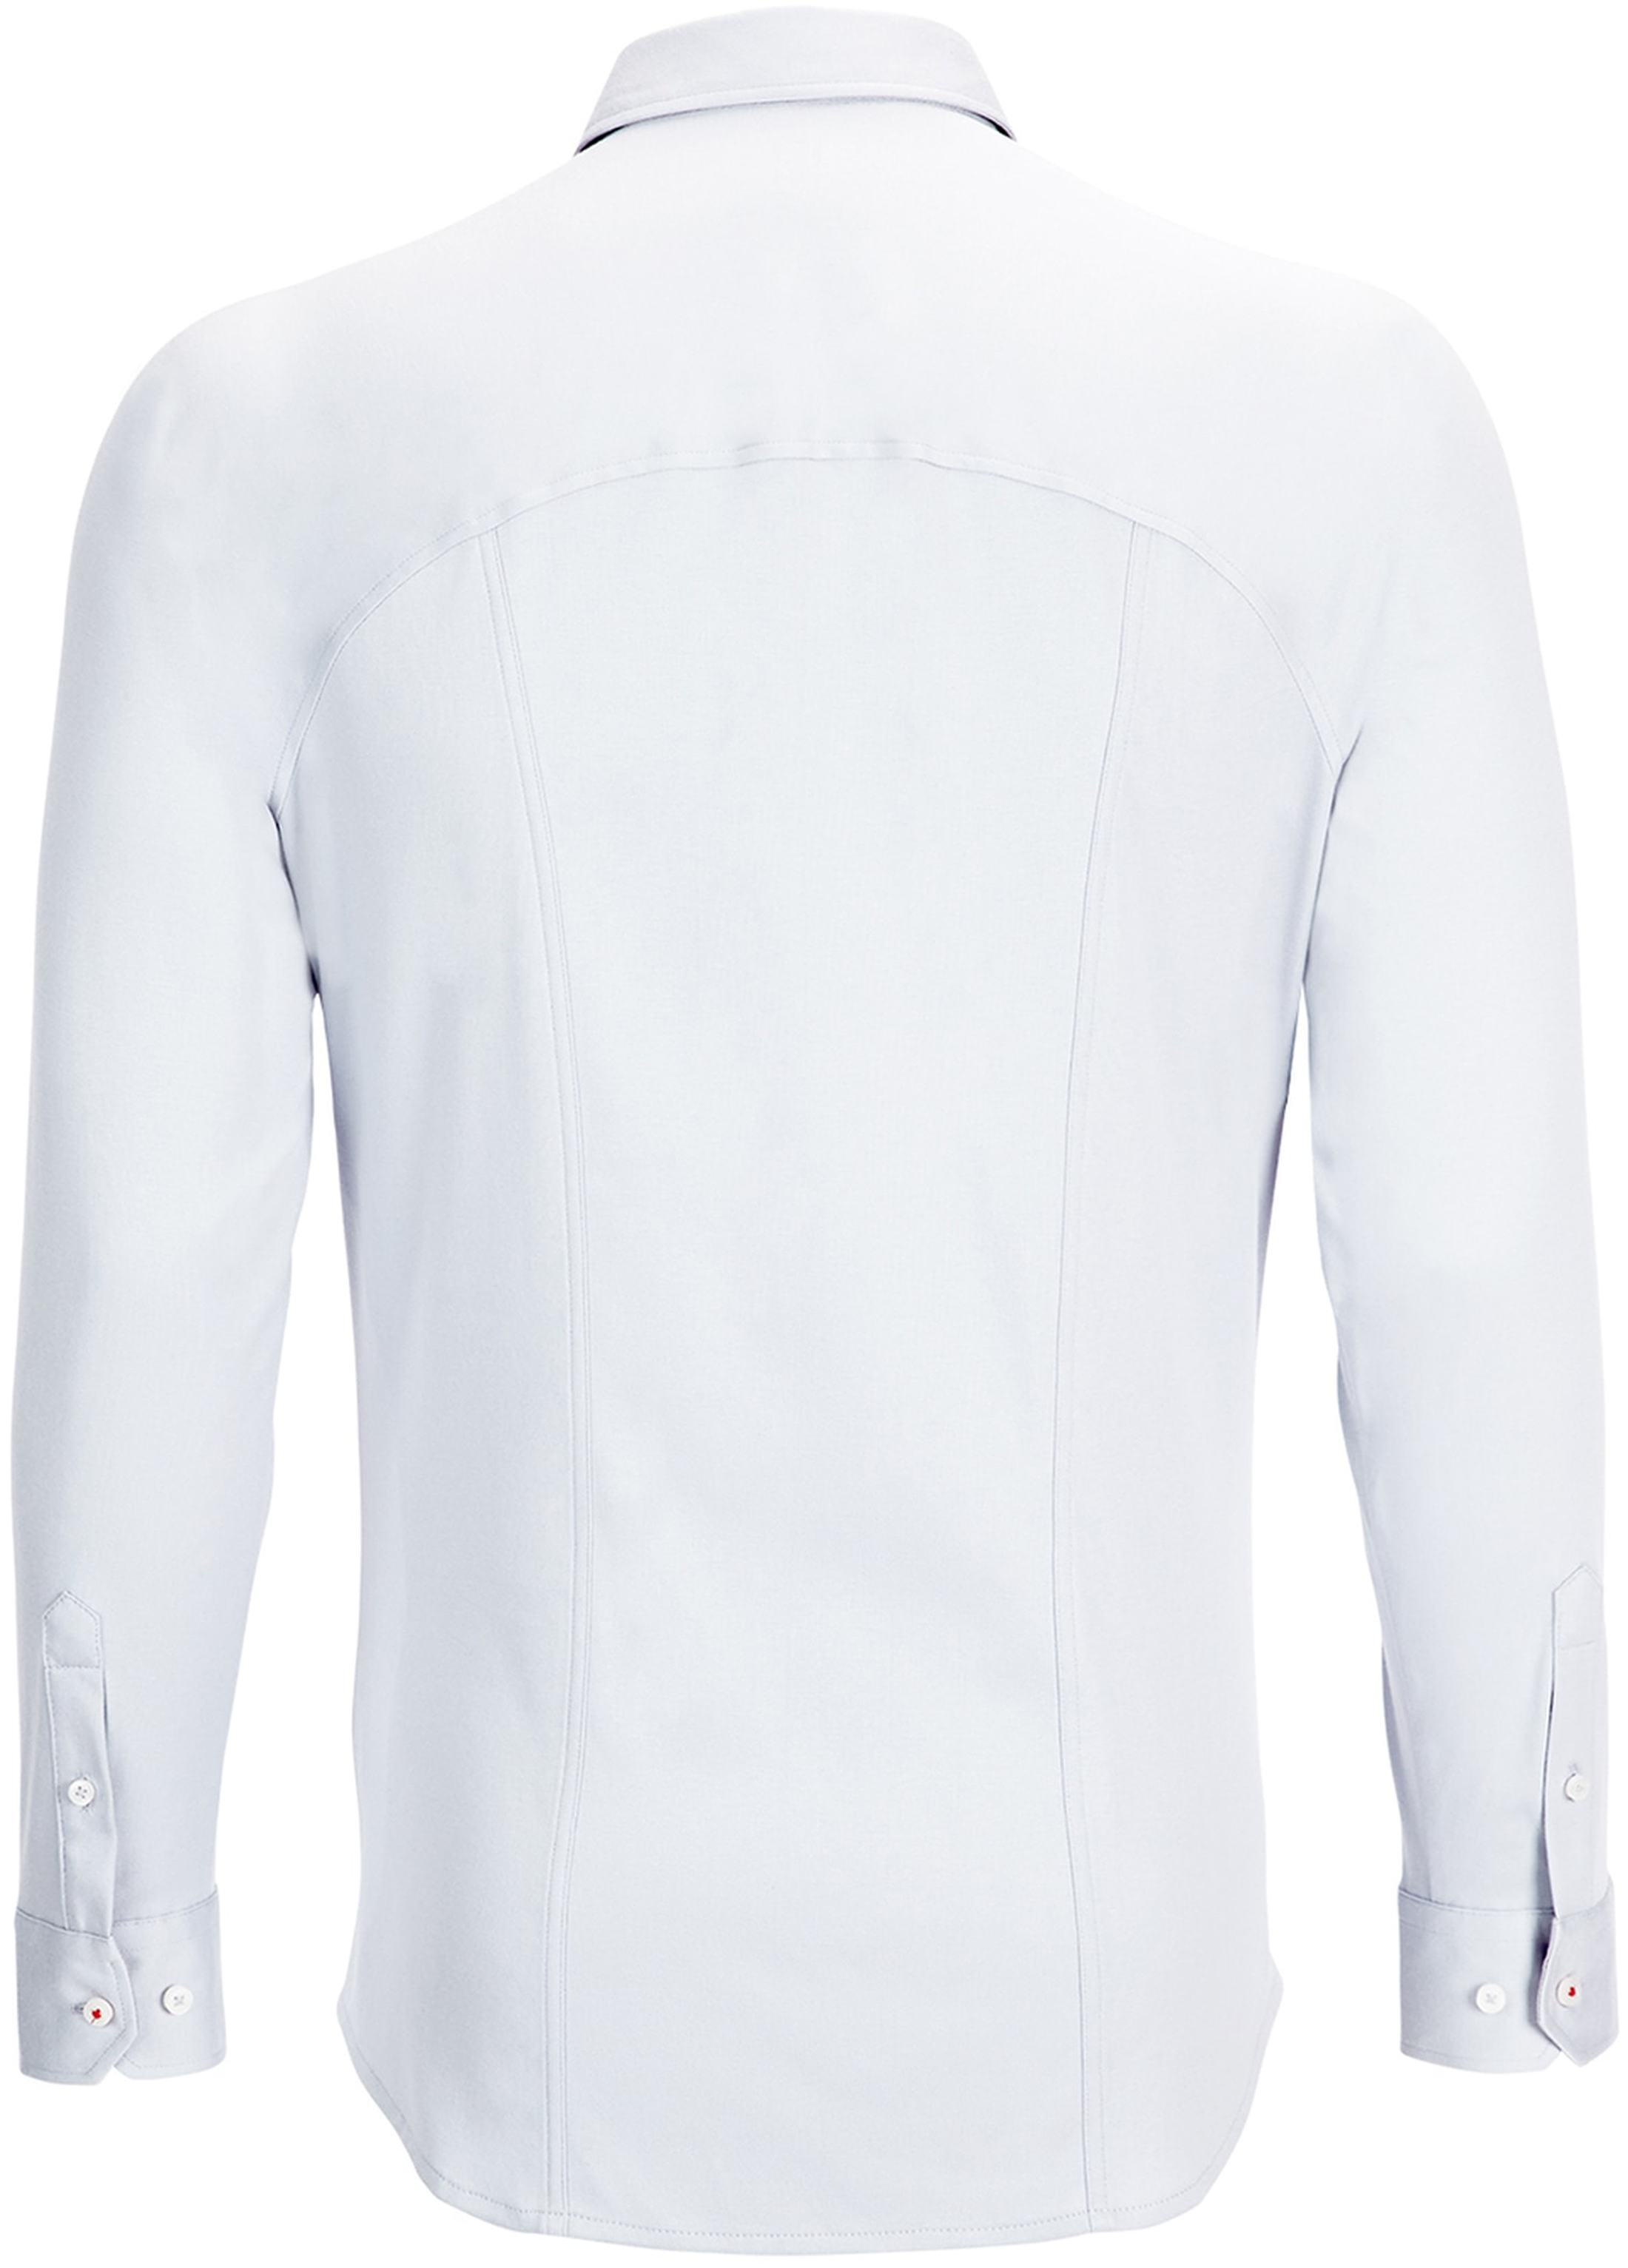 Desoto Overhemd Strijkvrij Wit foto 1